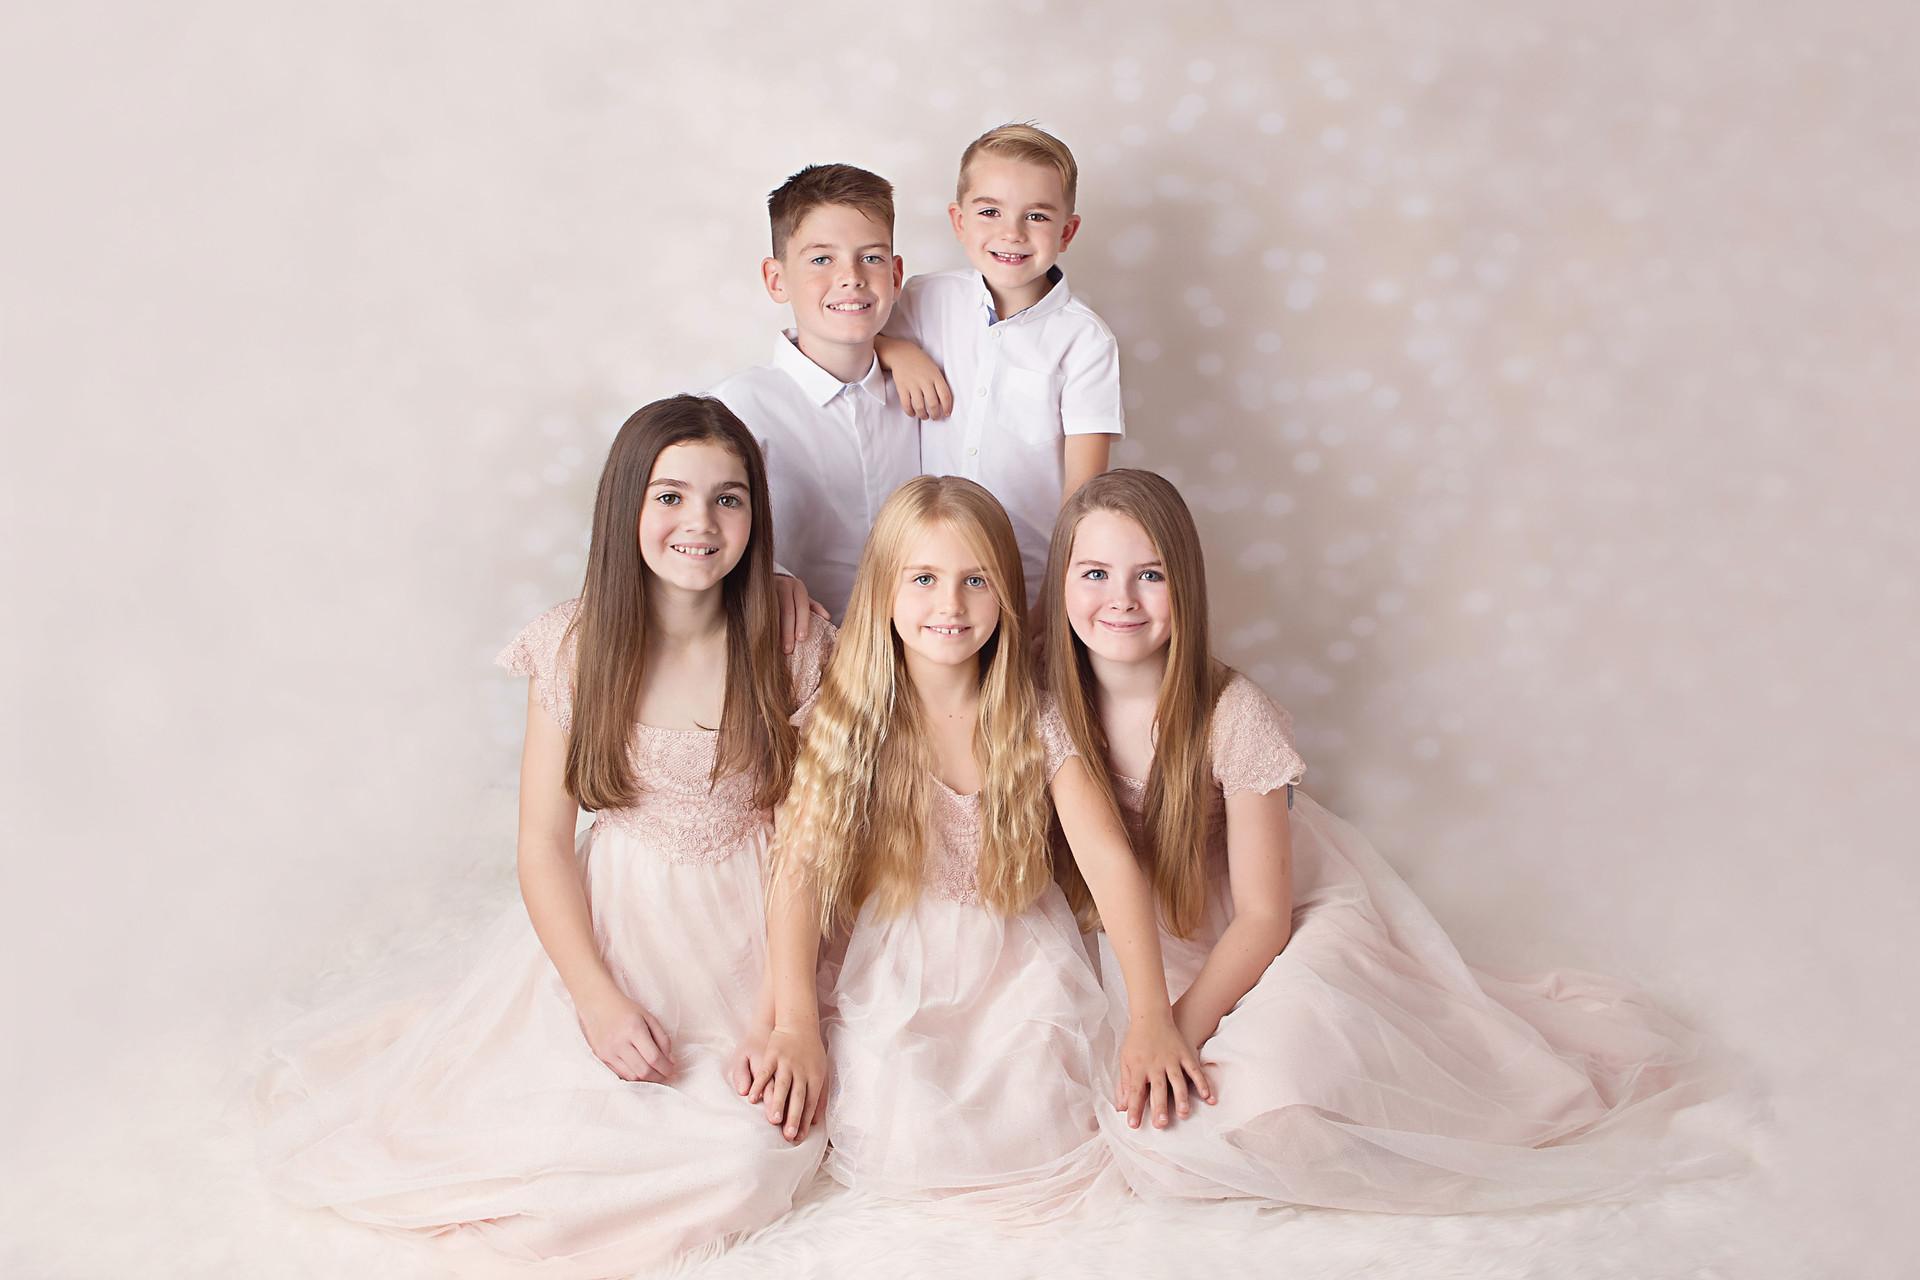 Family Photograph Yanchep Perth